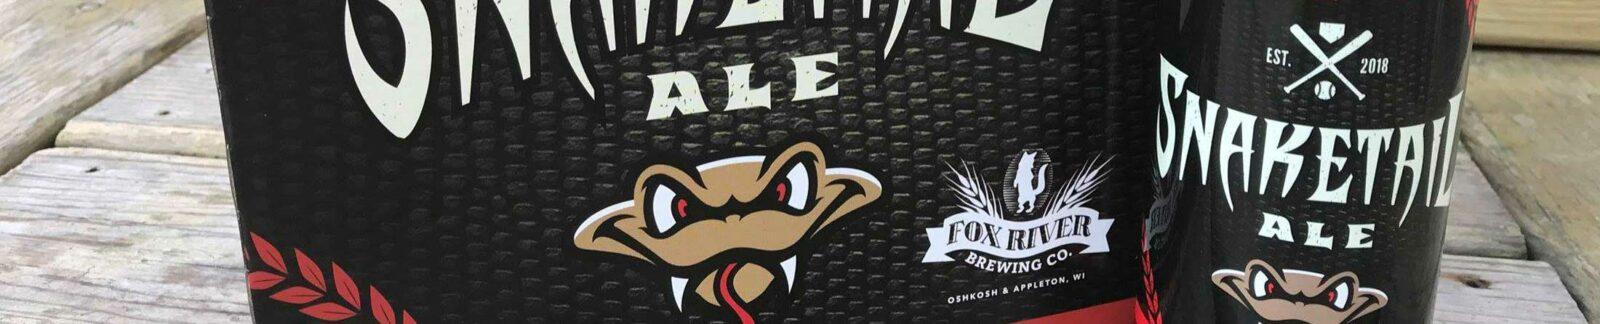 Snaketail Ale – Fox River Brewing header